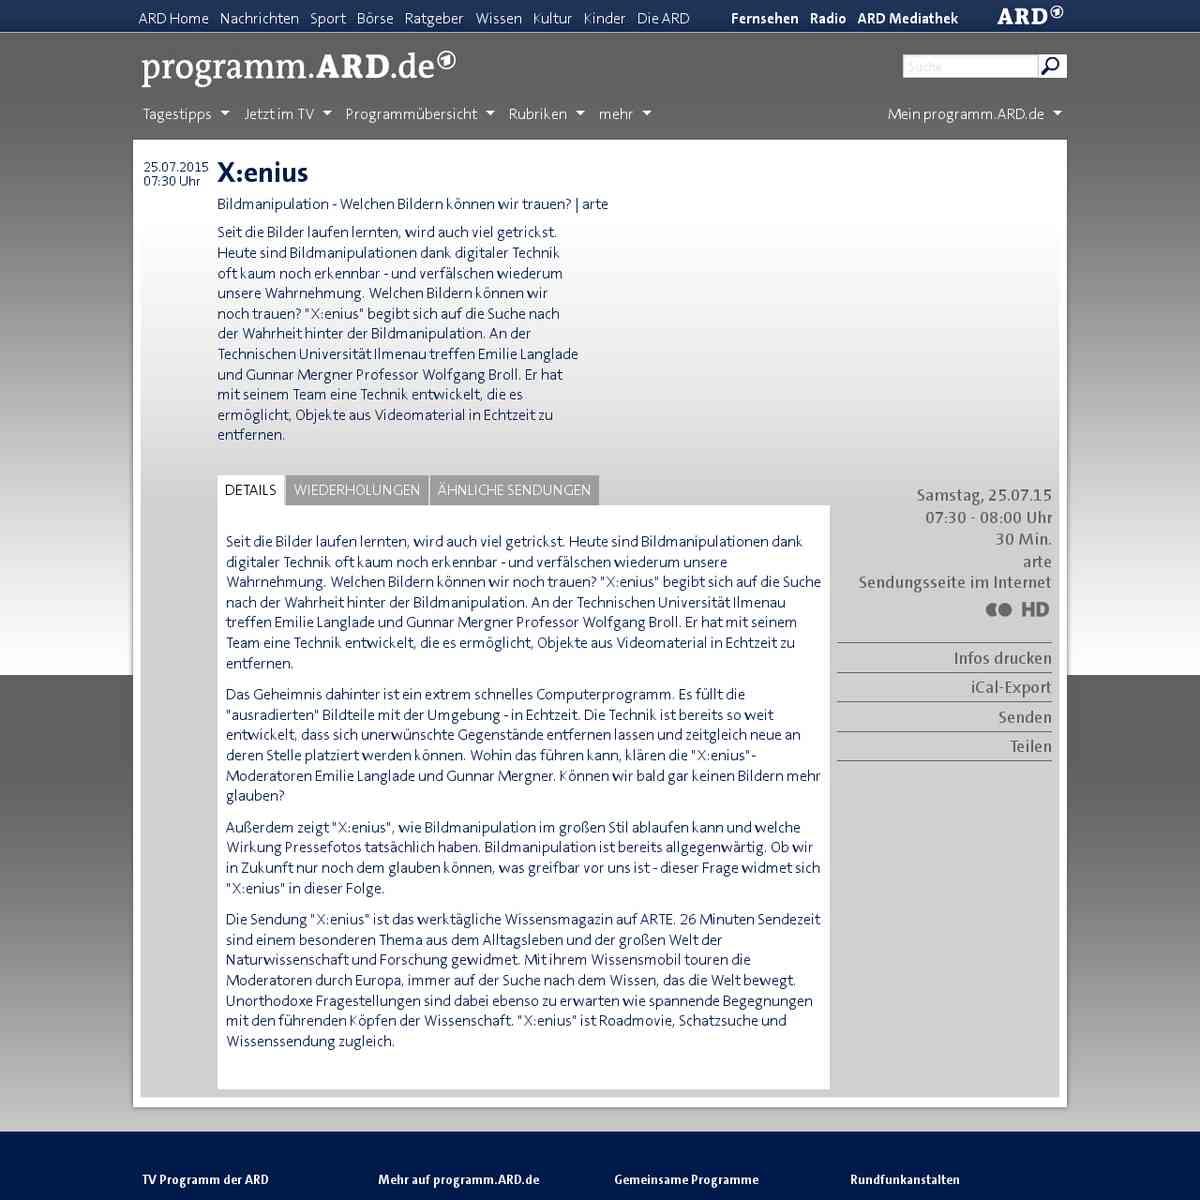 X:enius - arte | programm.ARD.de